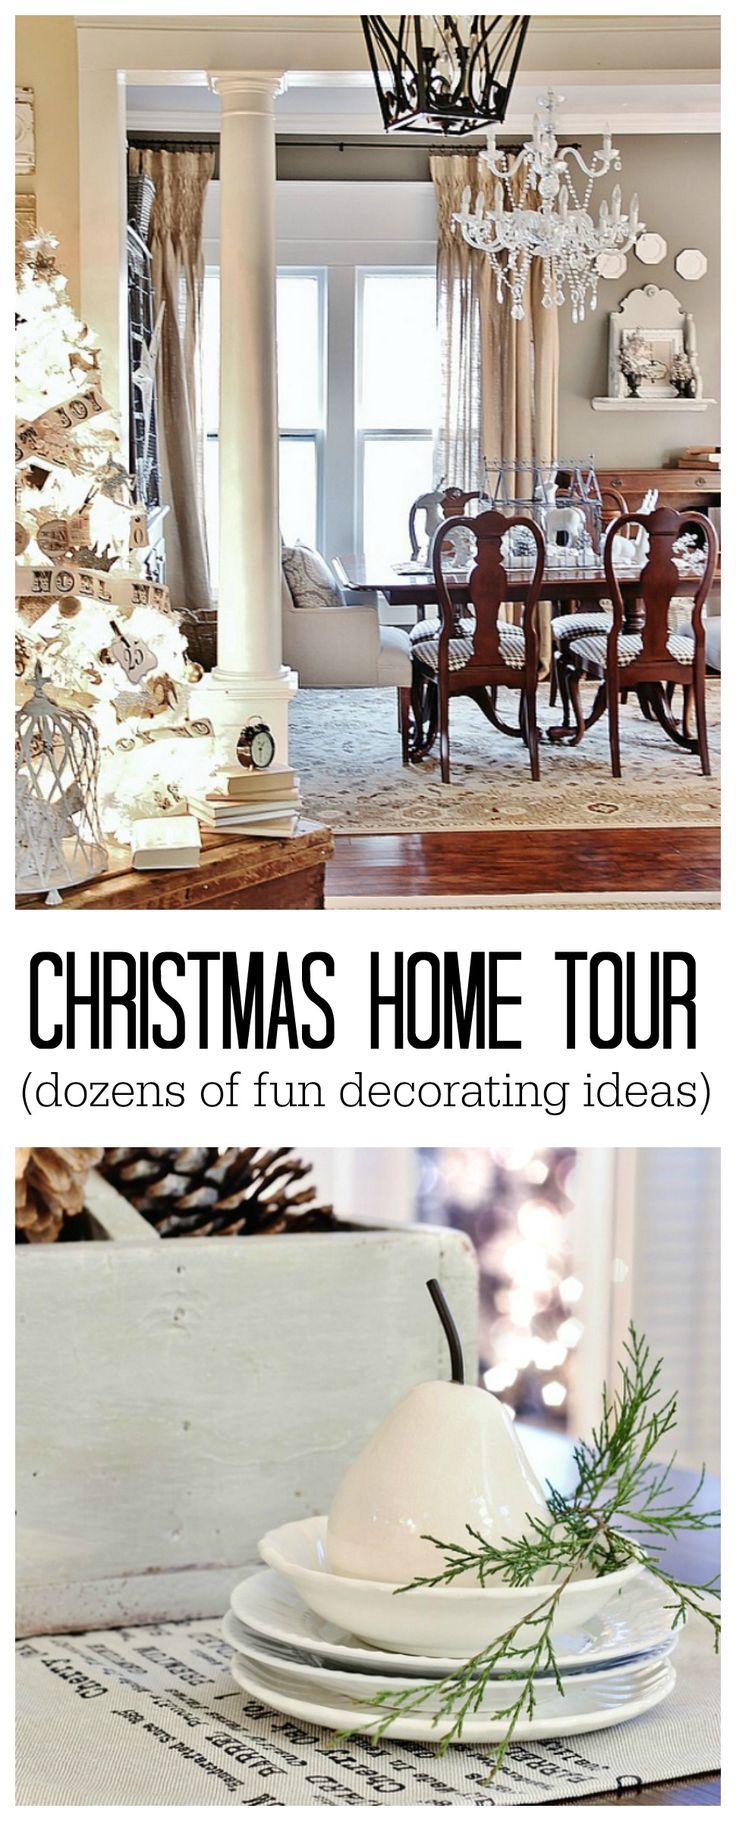 7 best Christmas decor images on Pinterest | Decorations, Hallmark ...